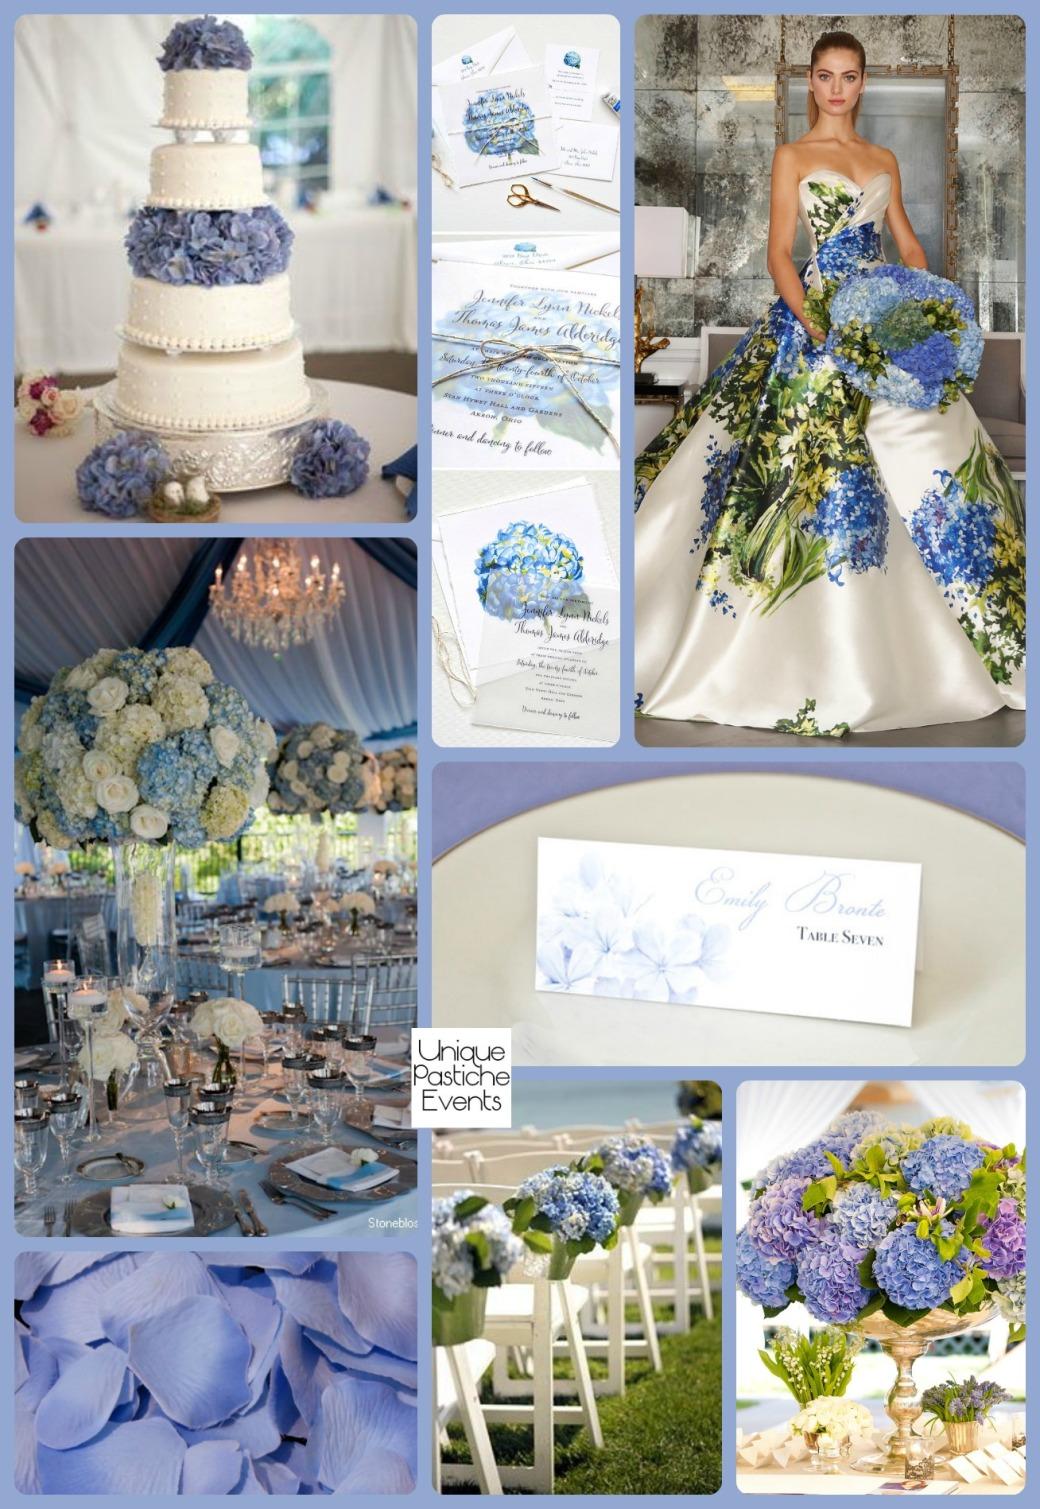 Elaborate Serenity Blue Hydrangea Wedding Ideas by Unique Pastiche Events Read the full post: https://uniquepasticheevents.com/2016/01/06/elaborate-serenity-blue-hydrangea-wedding-ideas/